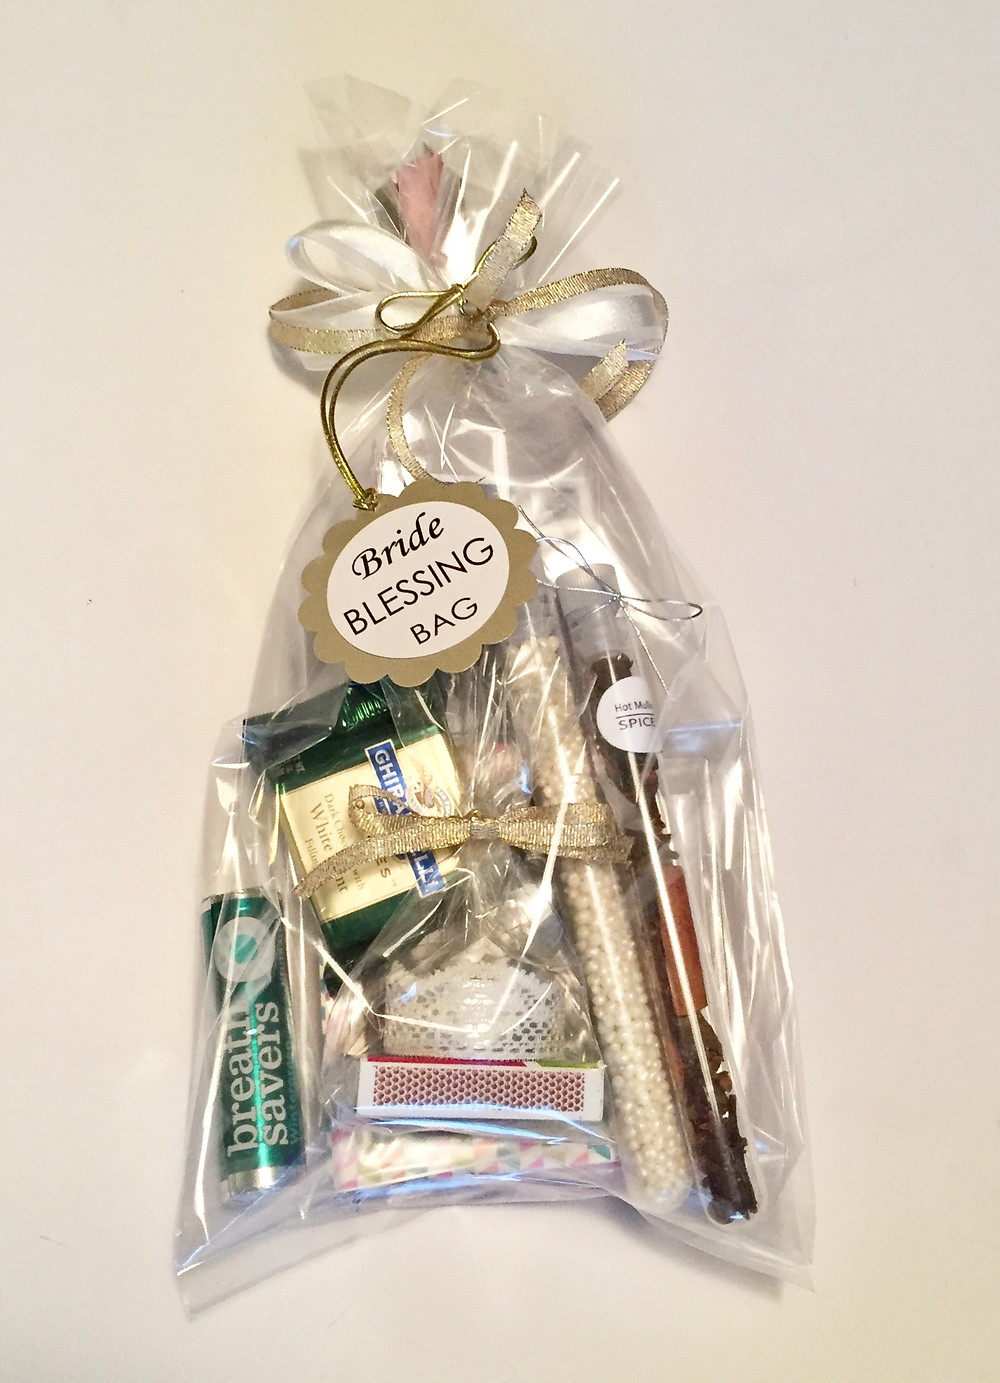 Blessing Bag for Breanna / Make a Bride Blessing Gift Bag / www.HoneycombOasis.com